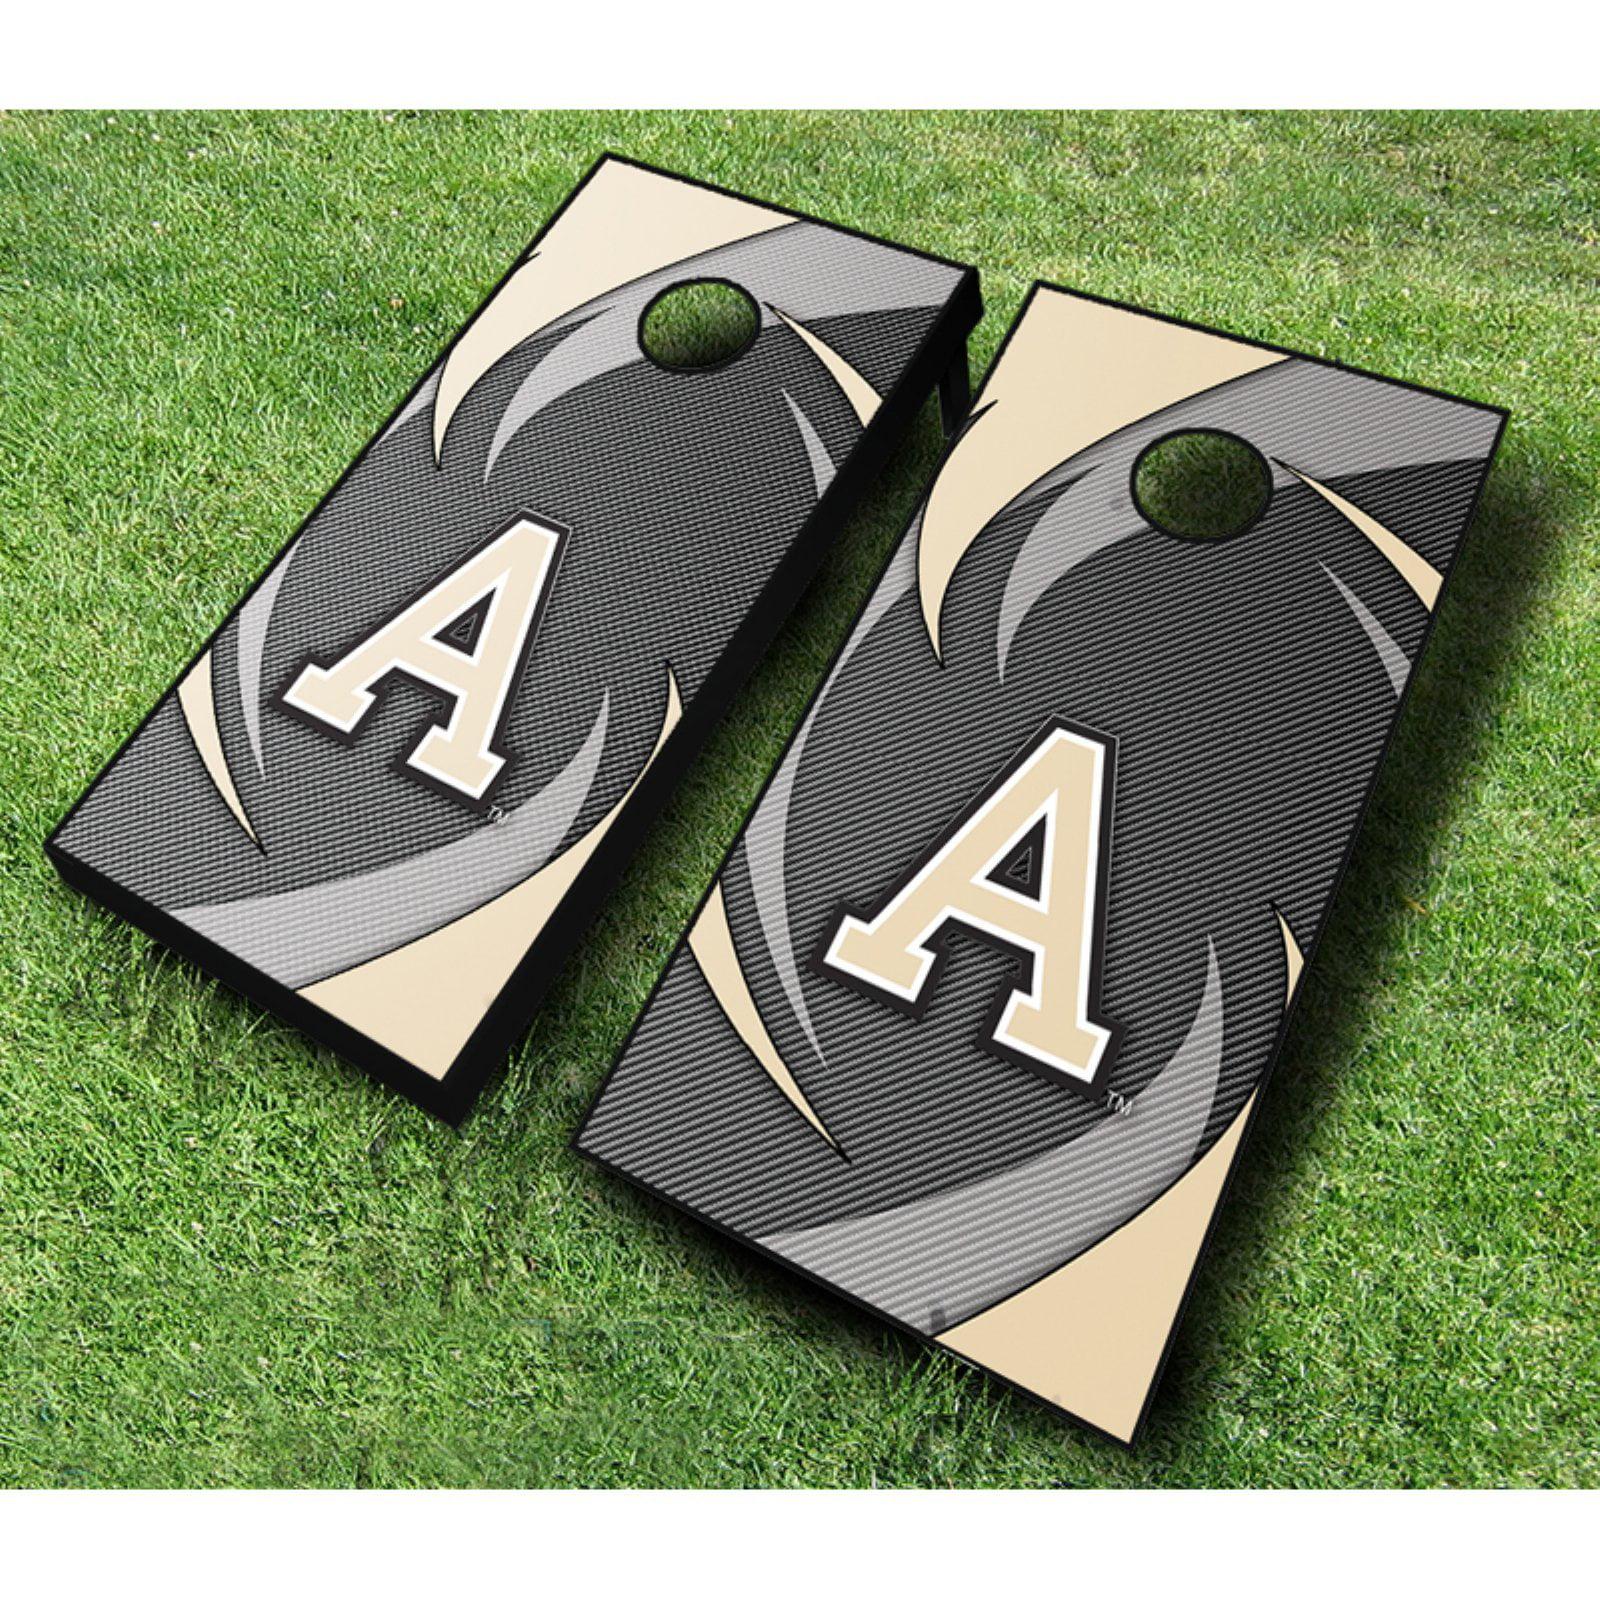 NCAA Army Black Knights Swoosh Cornhole Set by AJJ Cornhole